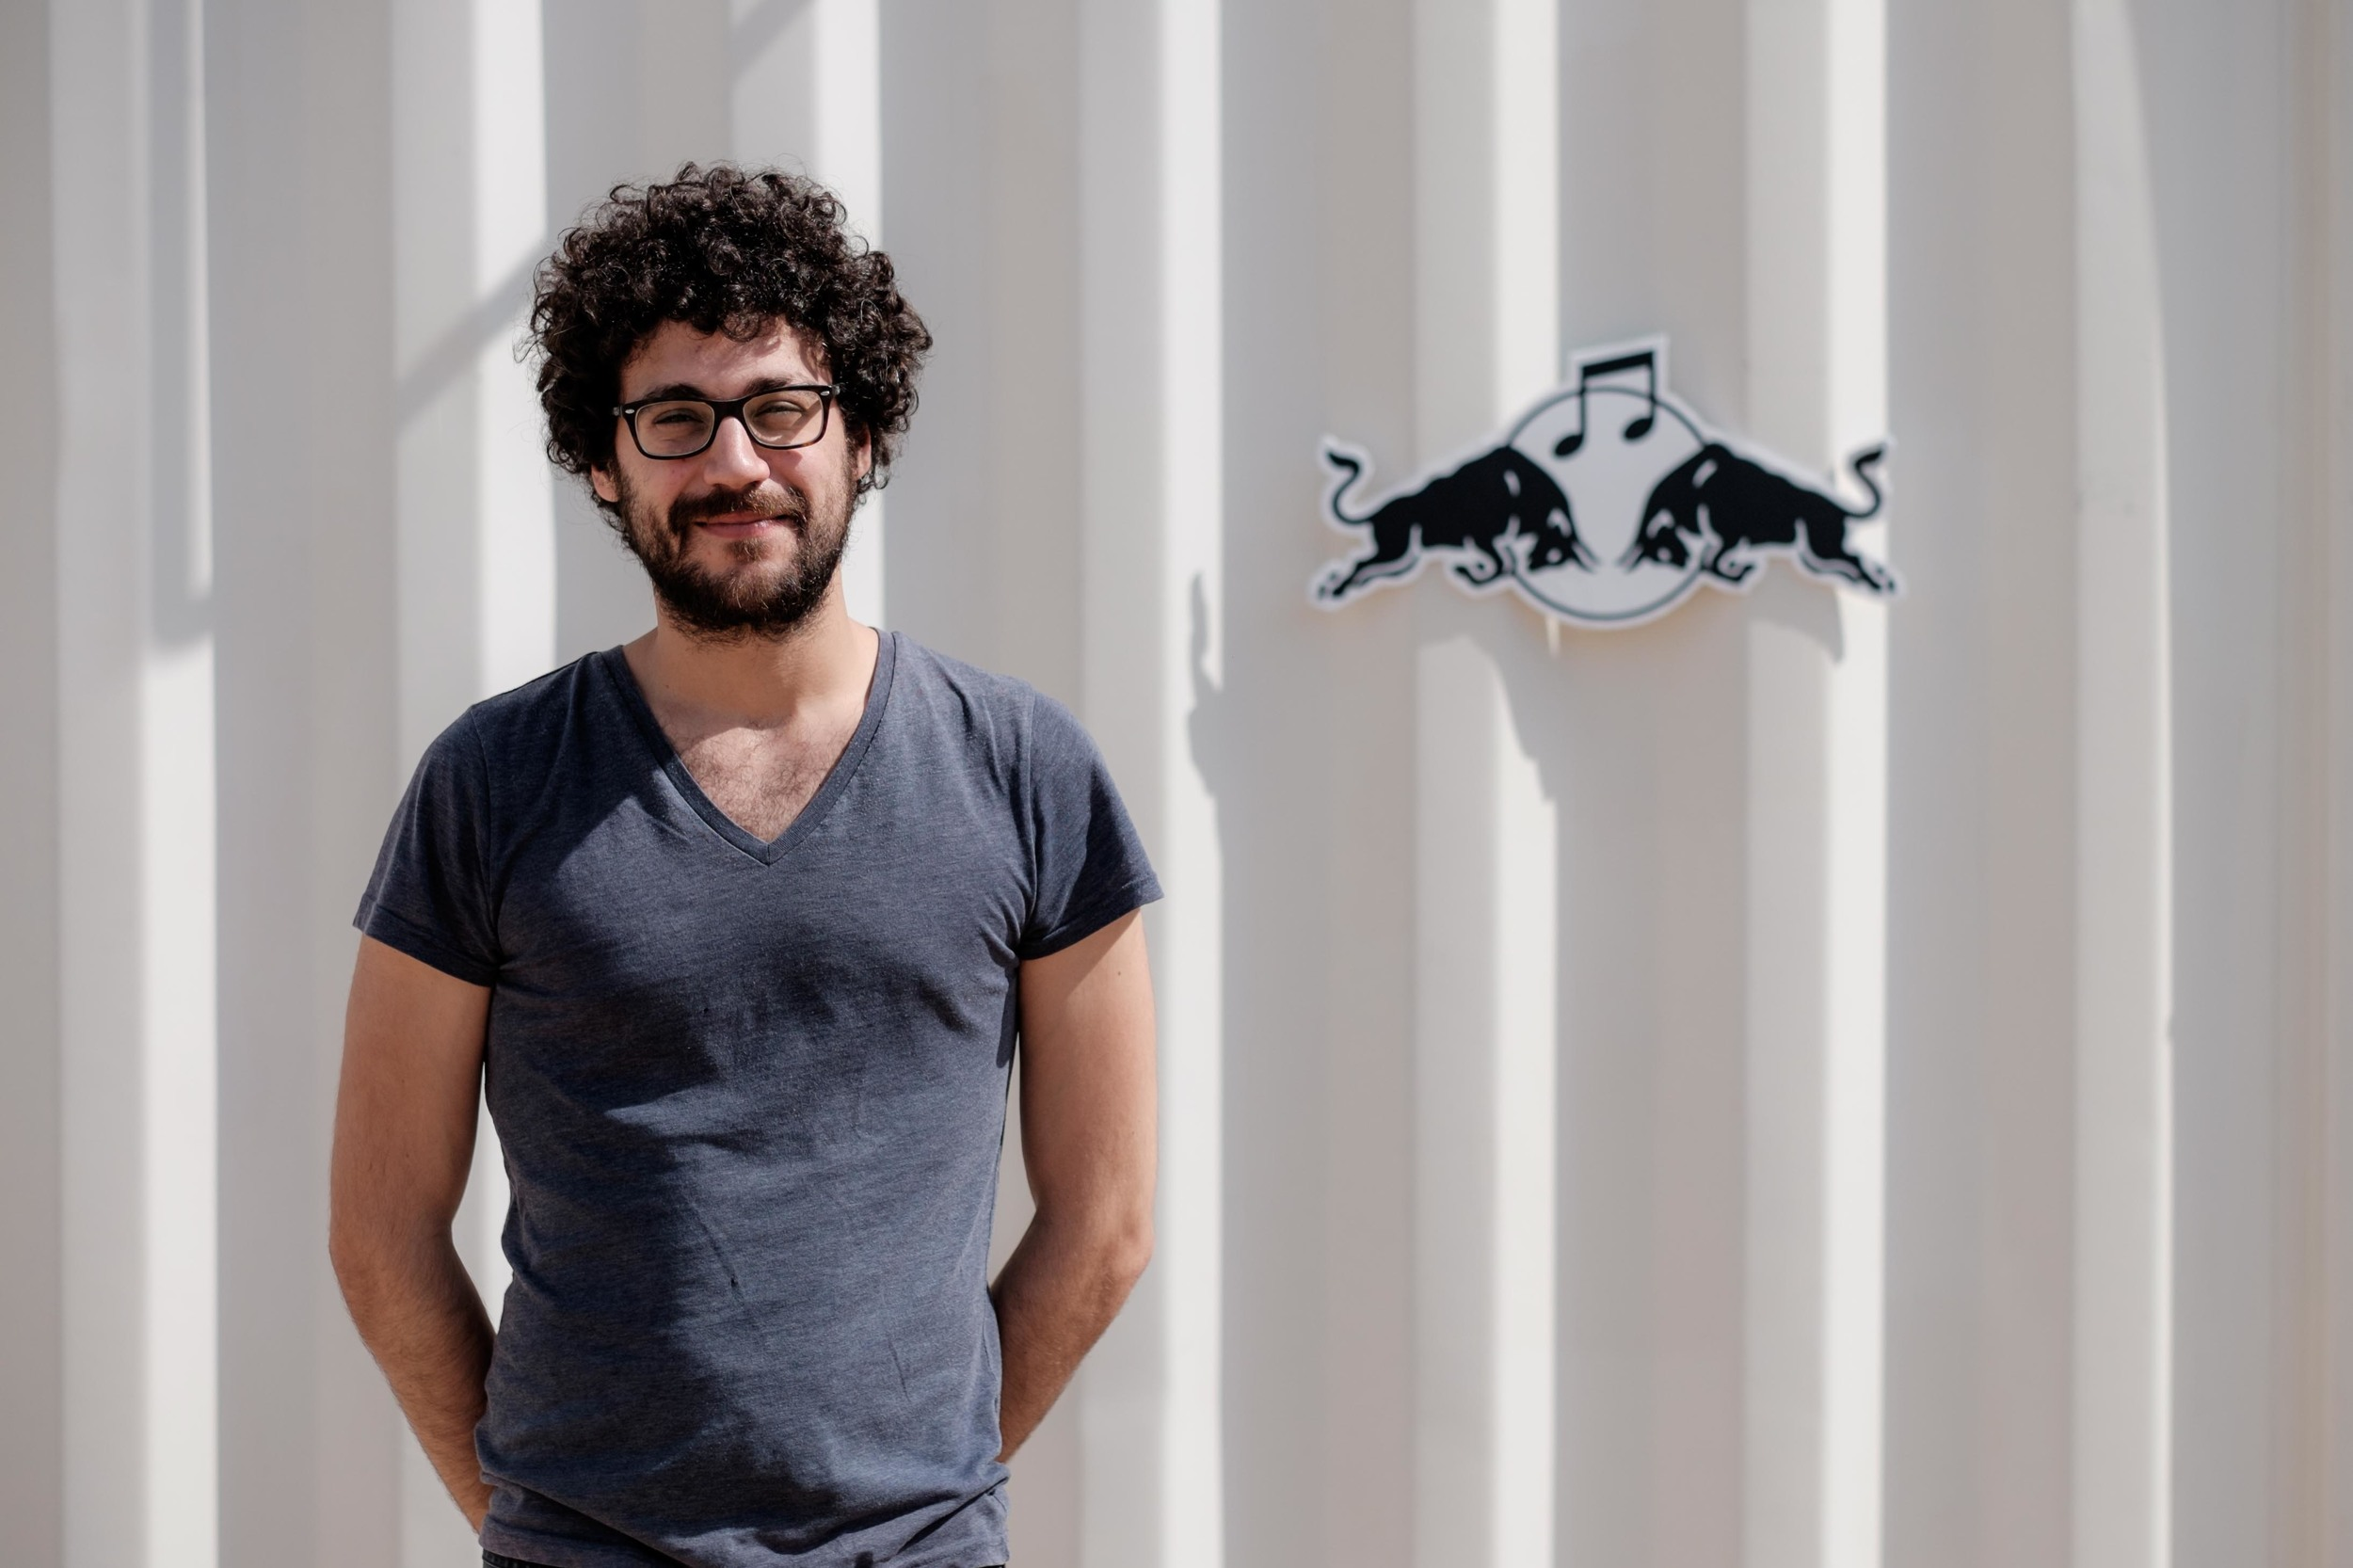 Etyen - Music producer, Composer, Sound Designer & Recording Artist. Red Bull Music Academy '16 Alum. OneBeat '15 Alum. Founder of the SAWA Music Residency.